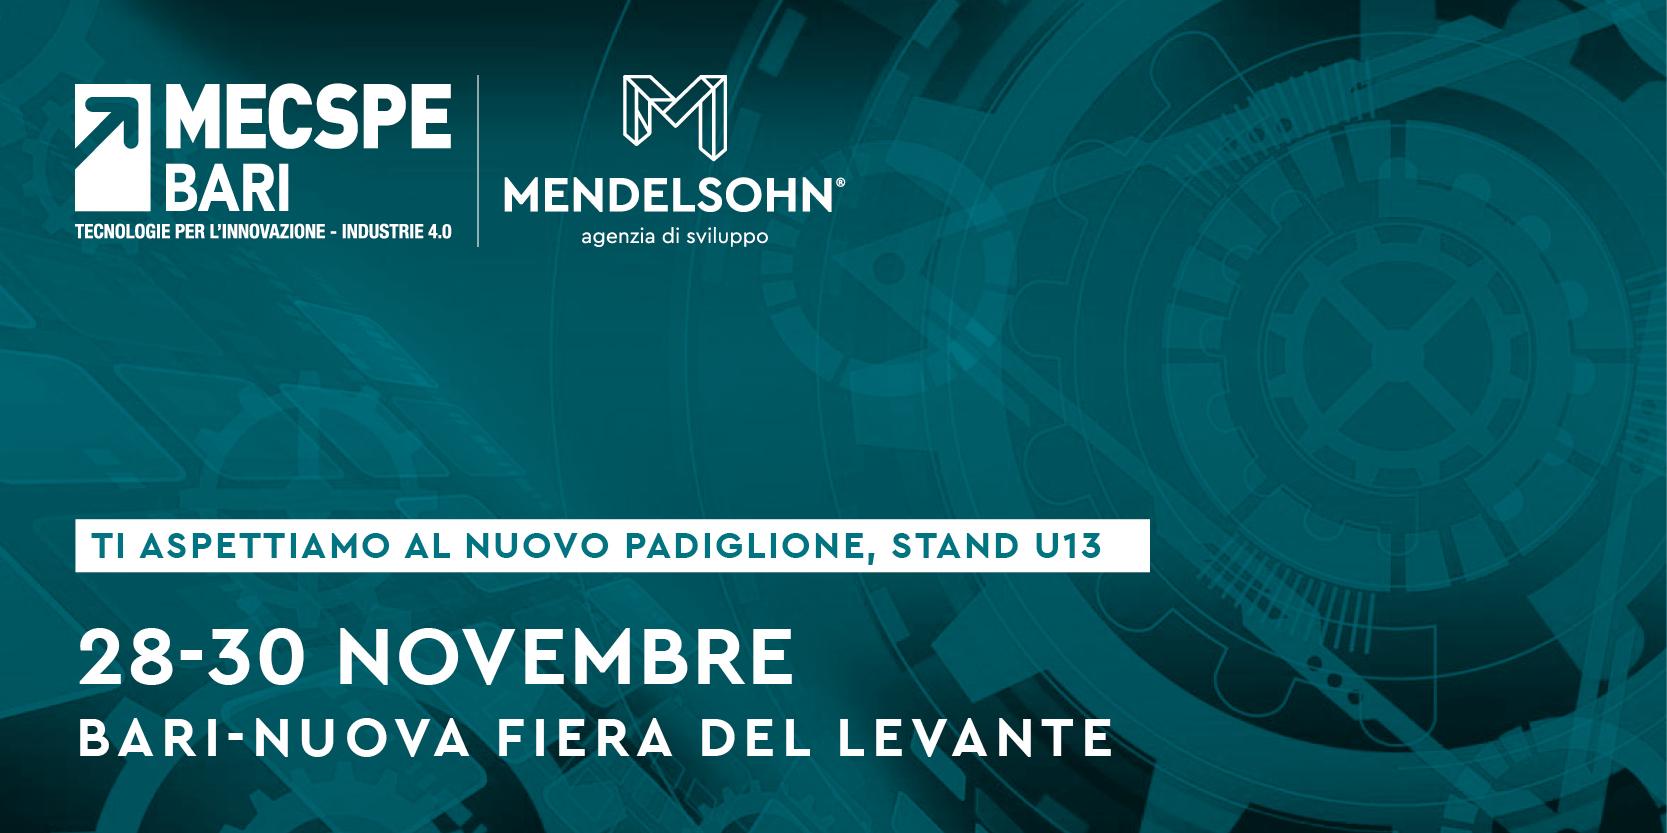 Mendelsohn a Mecspe Bari 2019